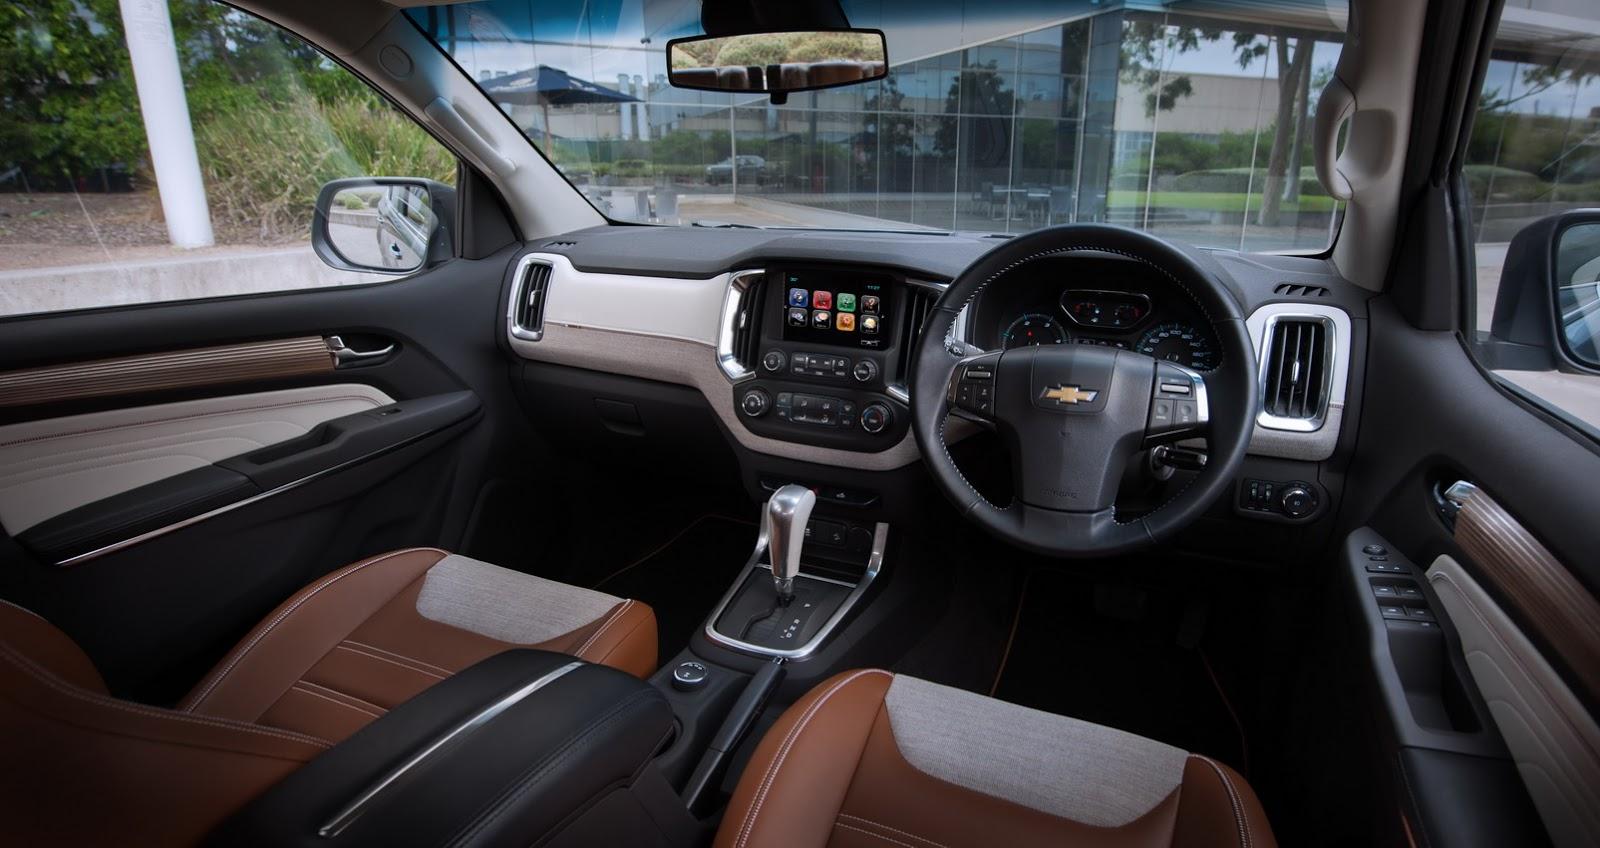 2017 Chevrolet Trailblazer Price Review Pictures Colors Specs